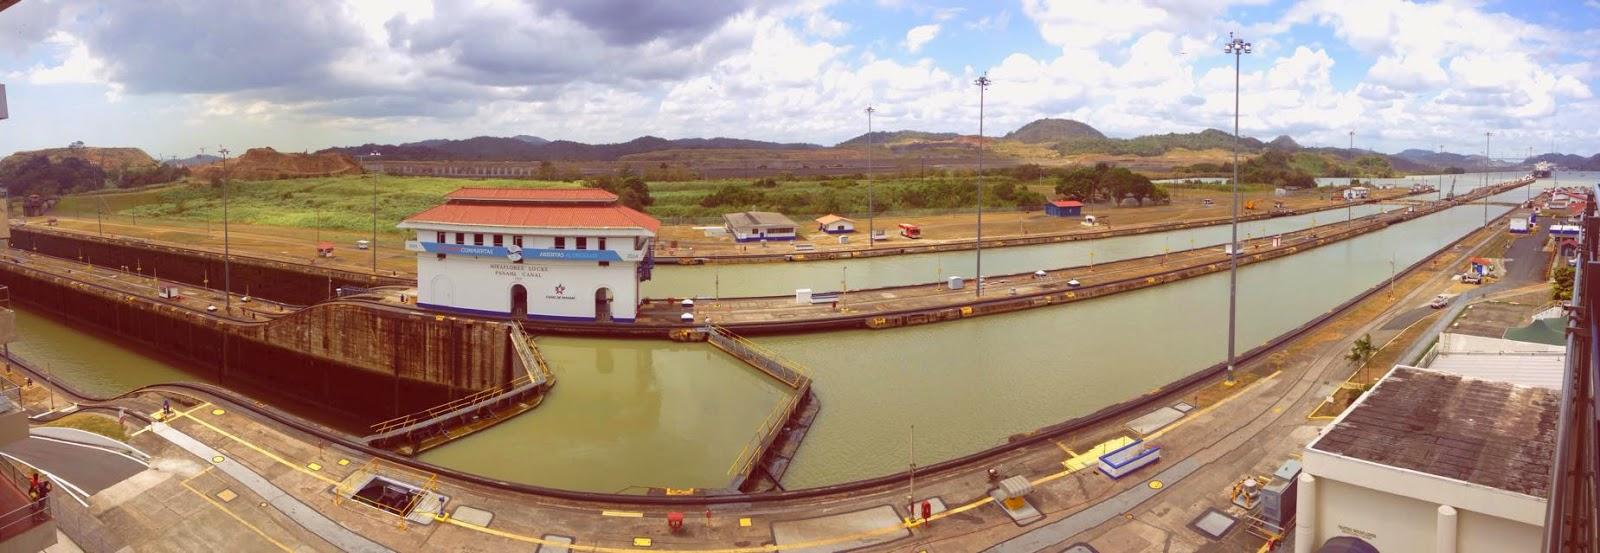 Miraflores Visitor Center, Panama Canal